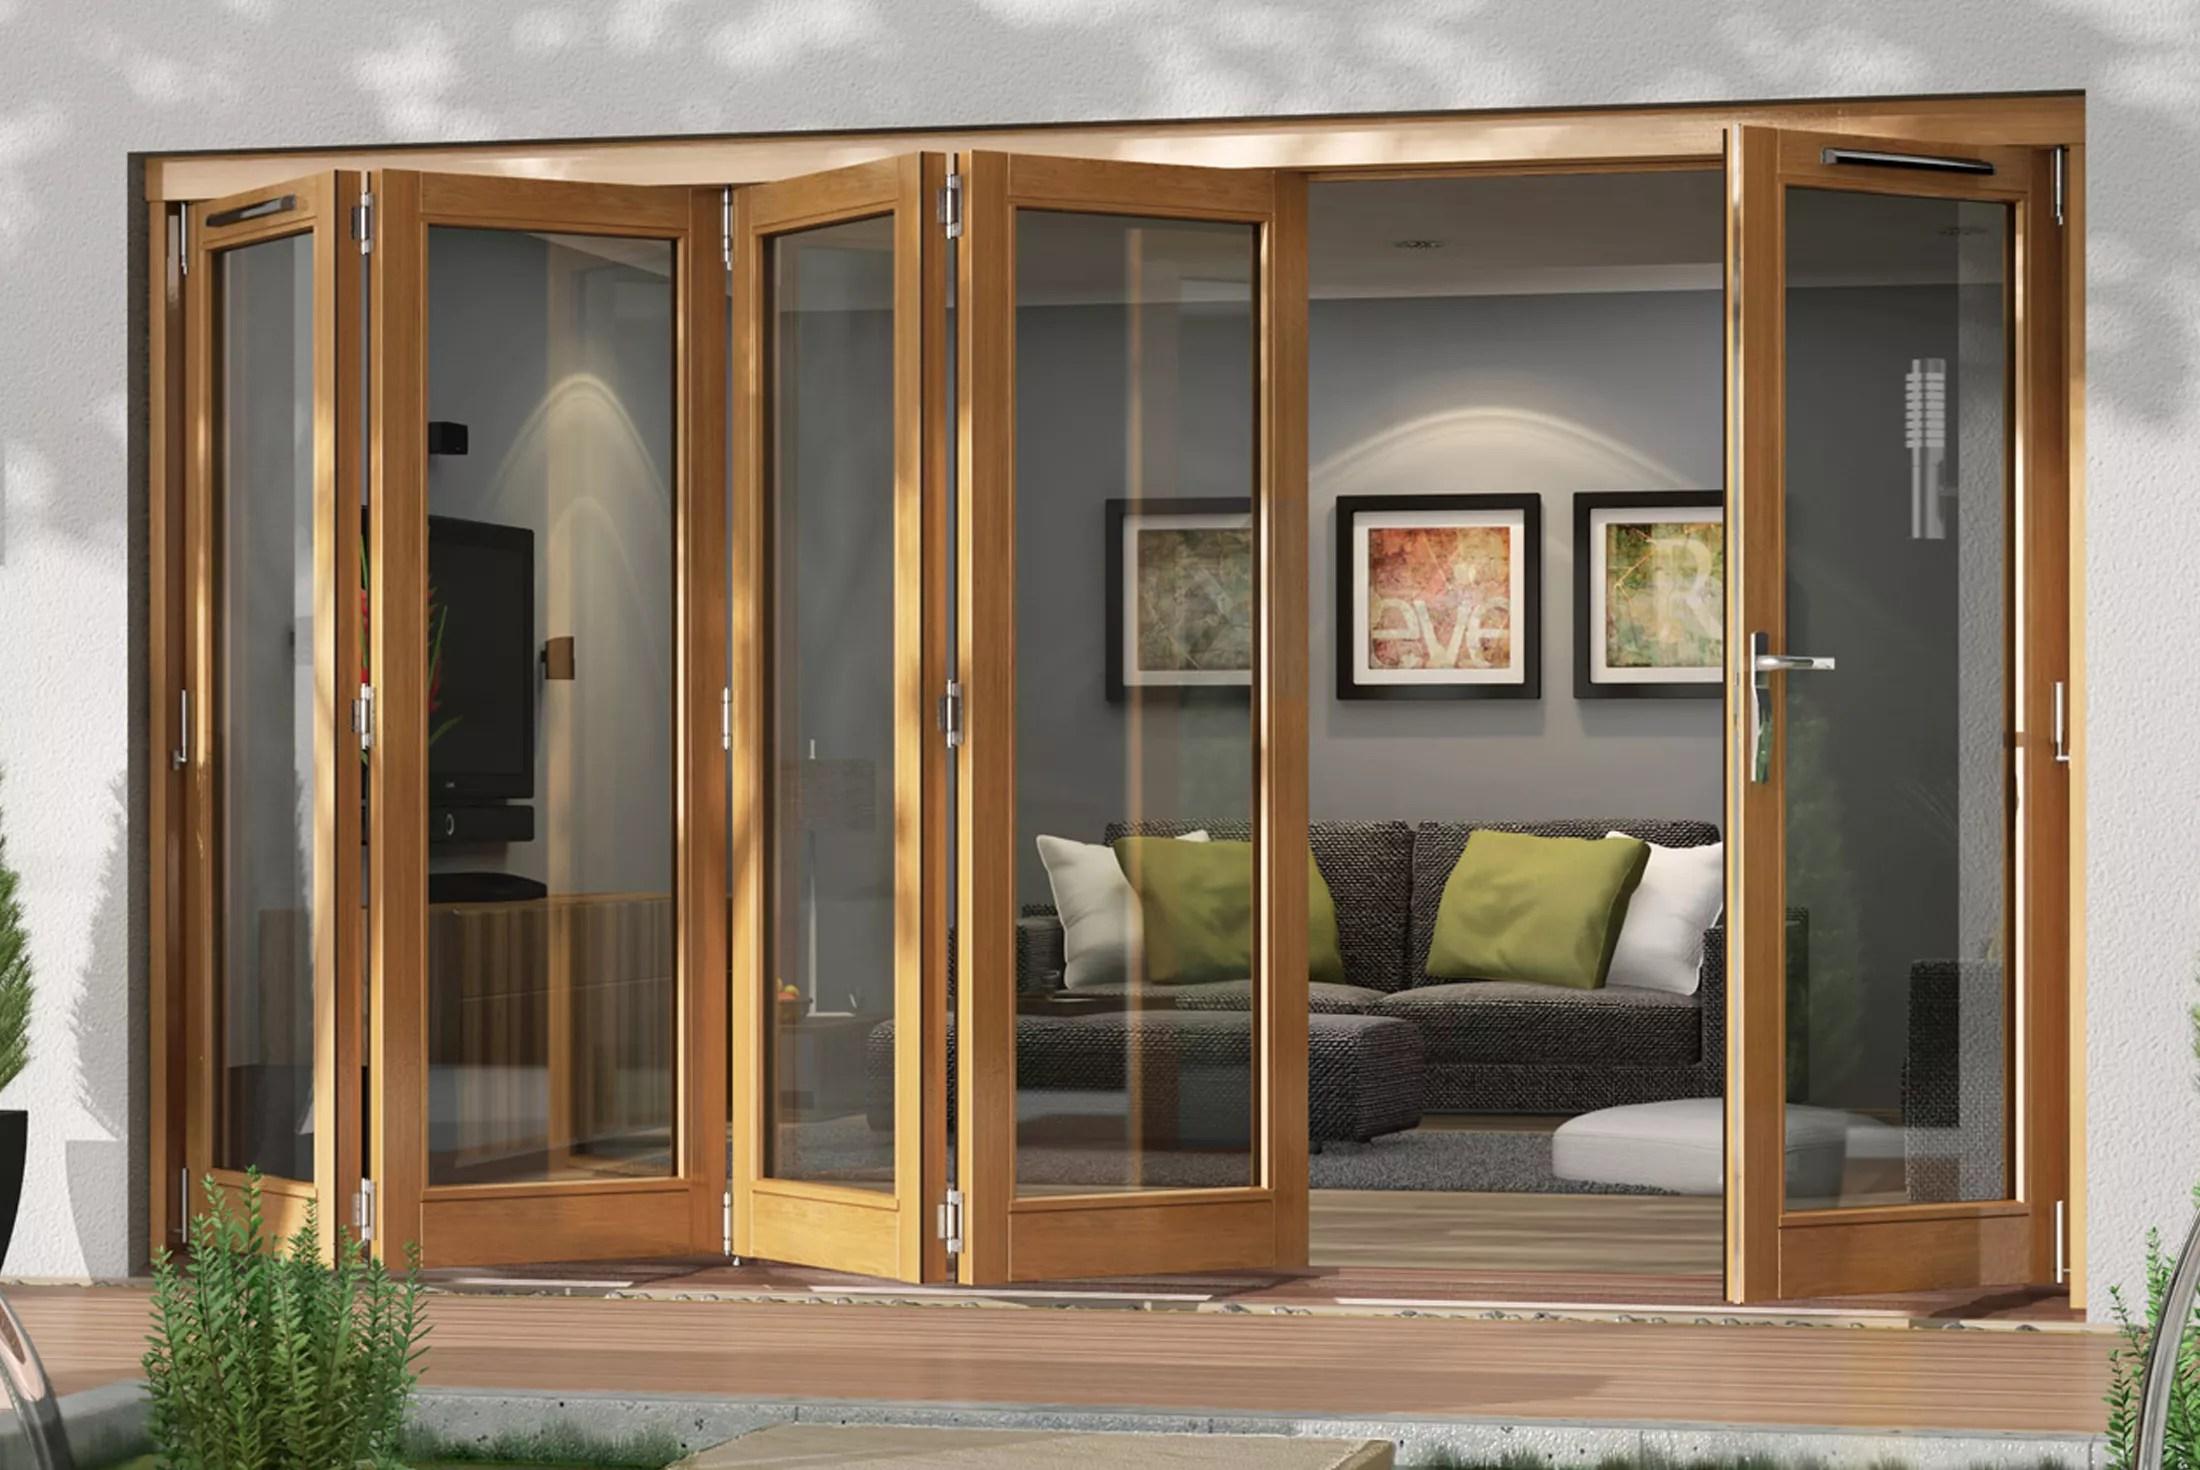 Patio doors buying guide | Help & Ideas | DIY at B&Q on Backdoor Patio Ideas id=94586